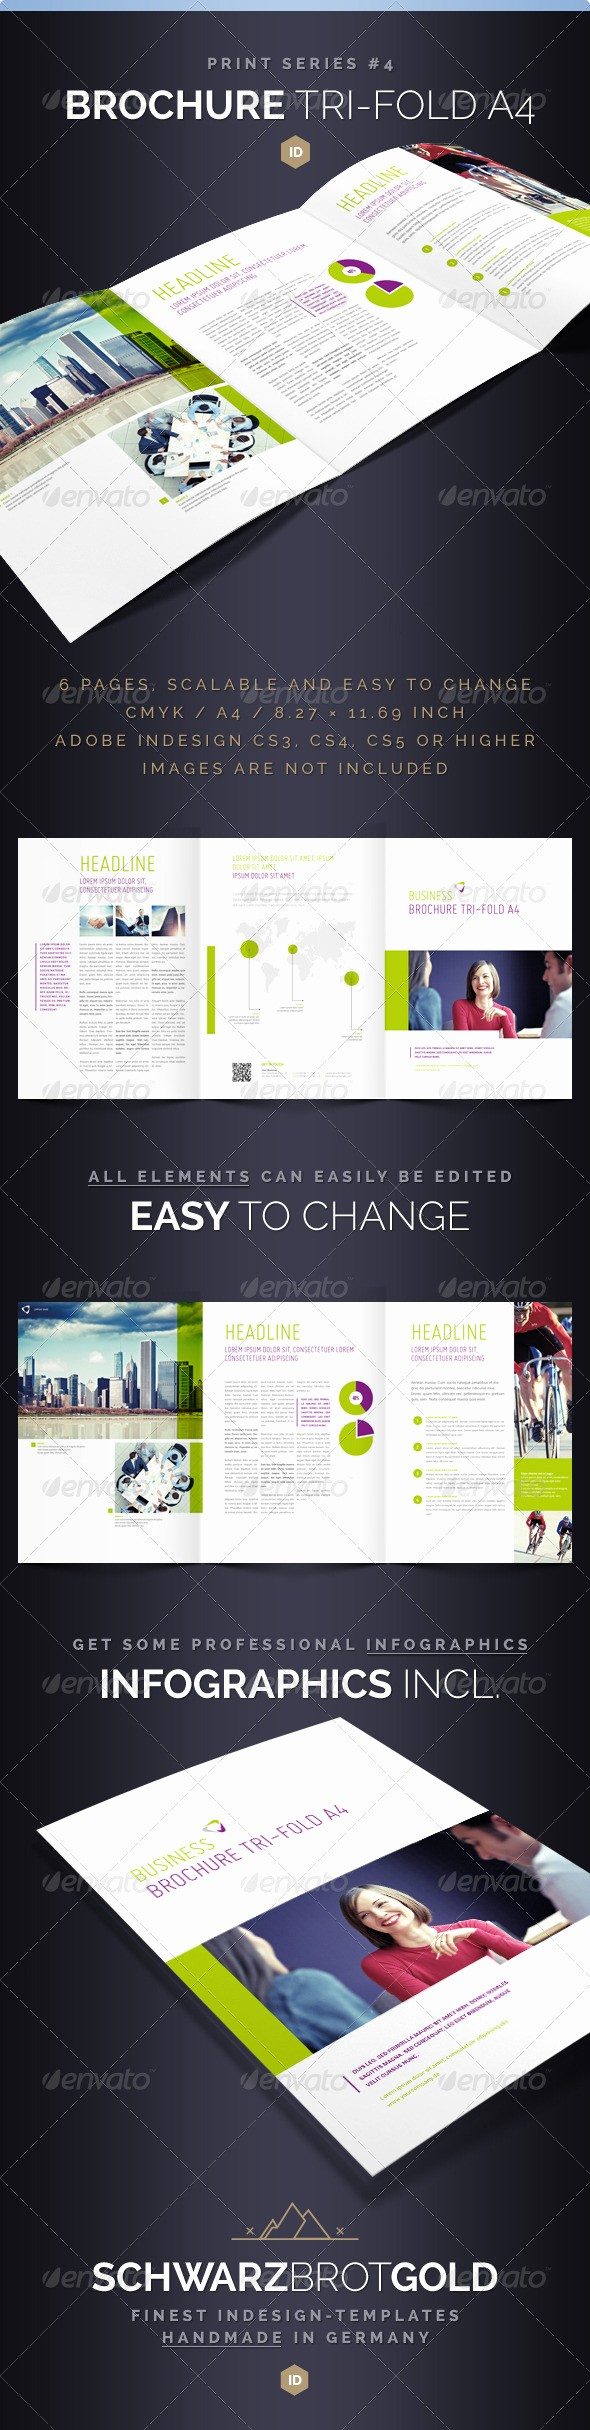 A4 Tri Fold Brochure Template Elegant Print Templates Brochure Tri Fold A4 Series 4